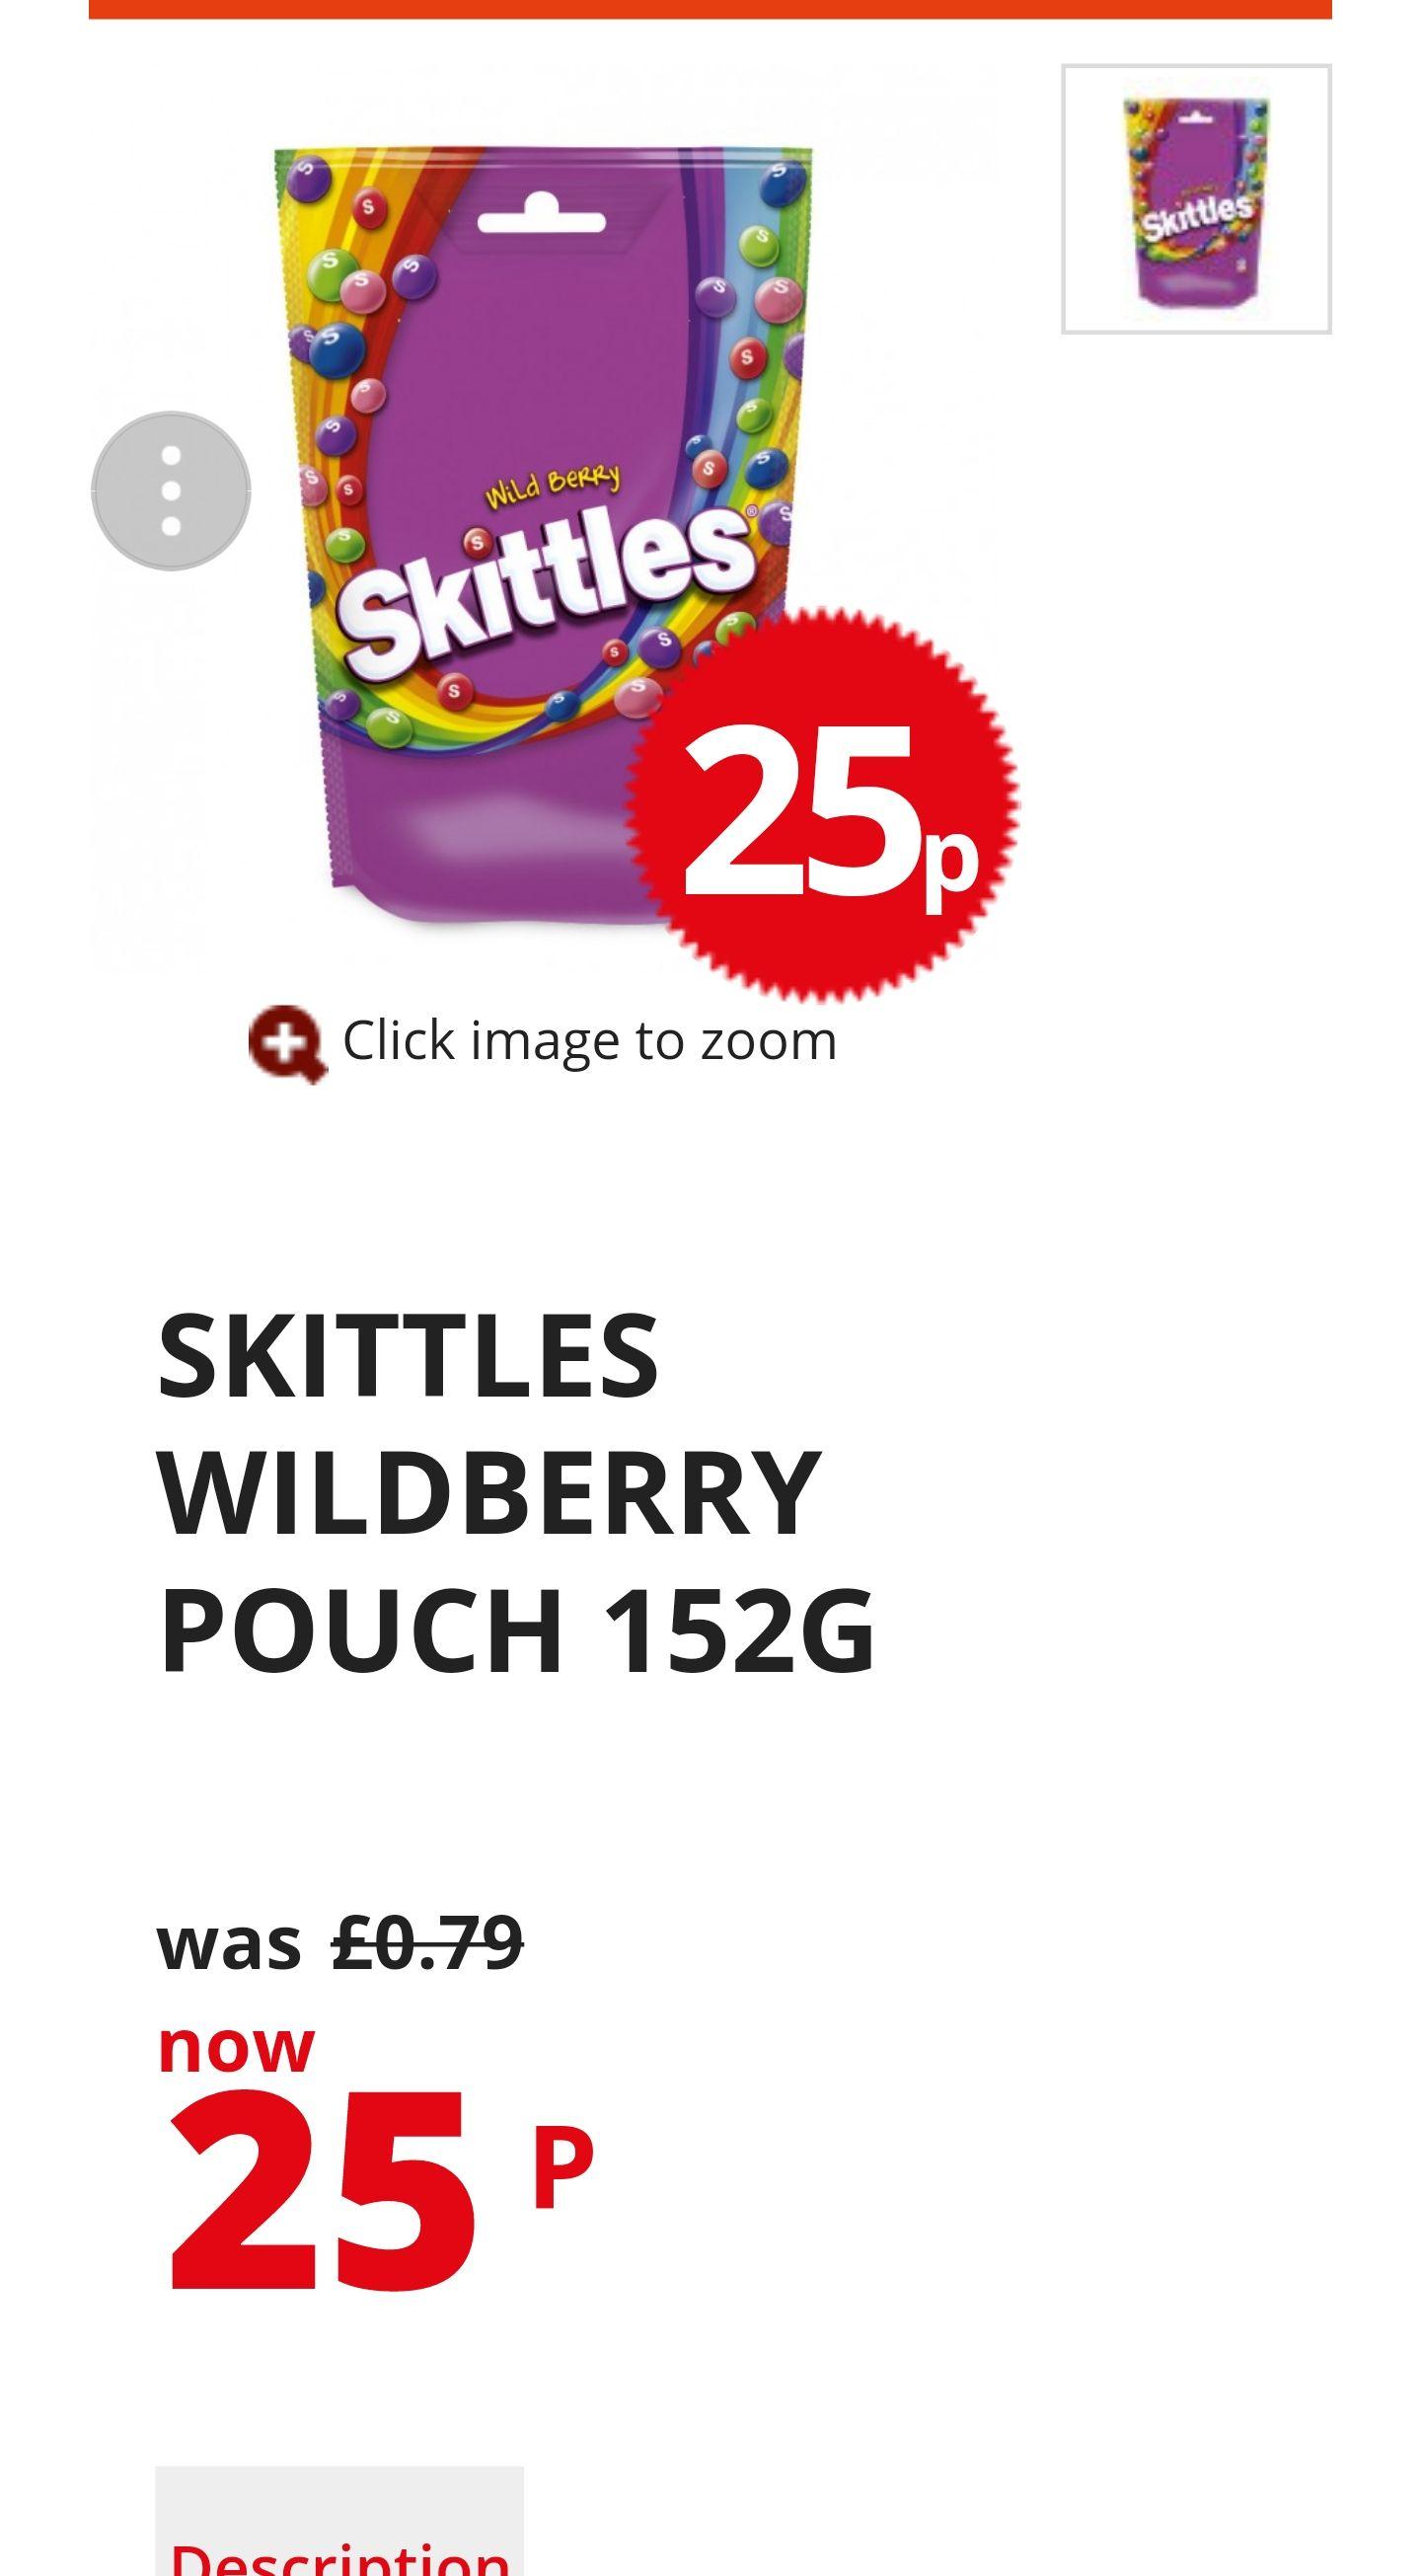 SKITTLES WILDBERRY POUCH 152G Poundstretcher 25p